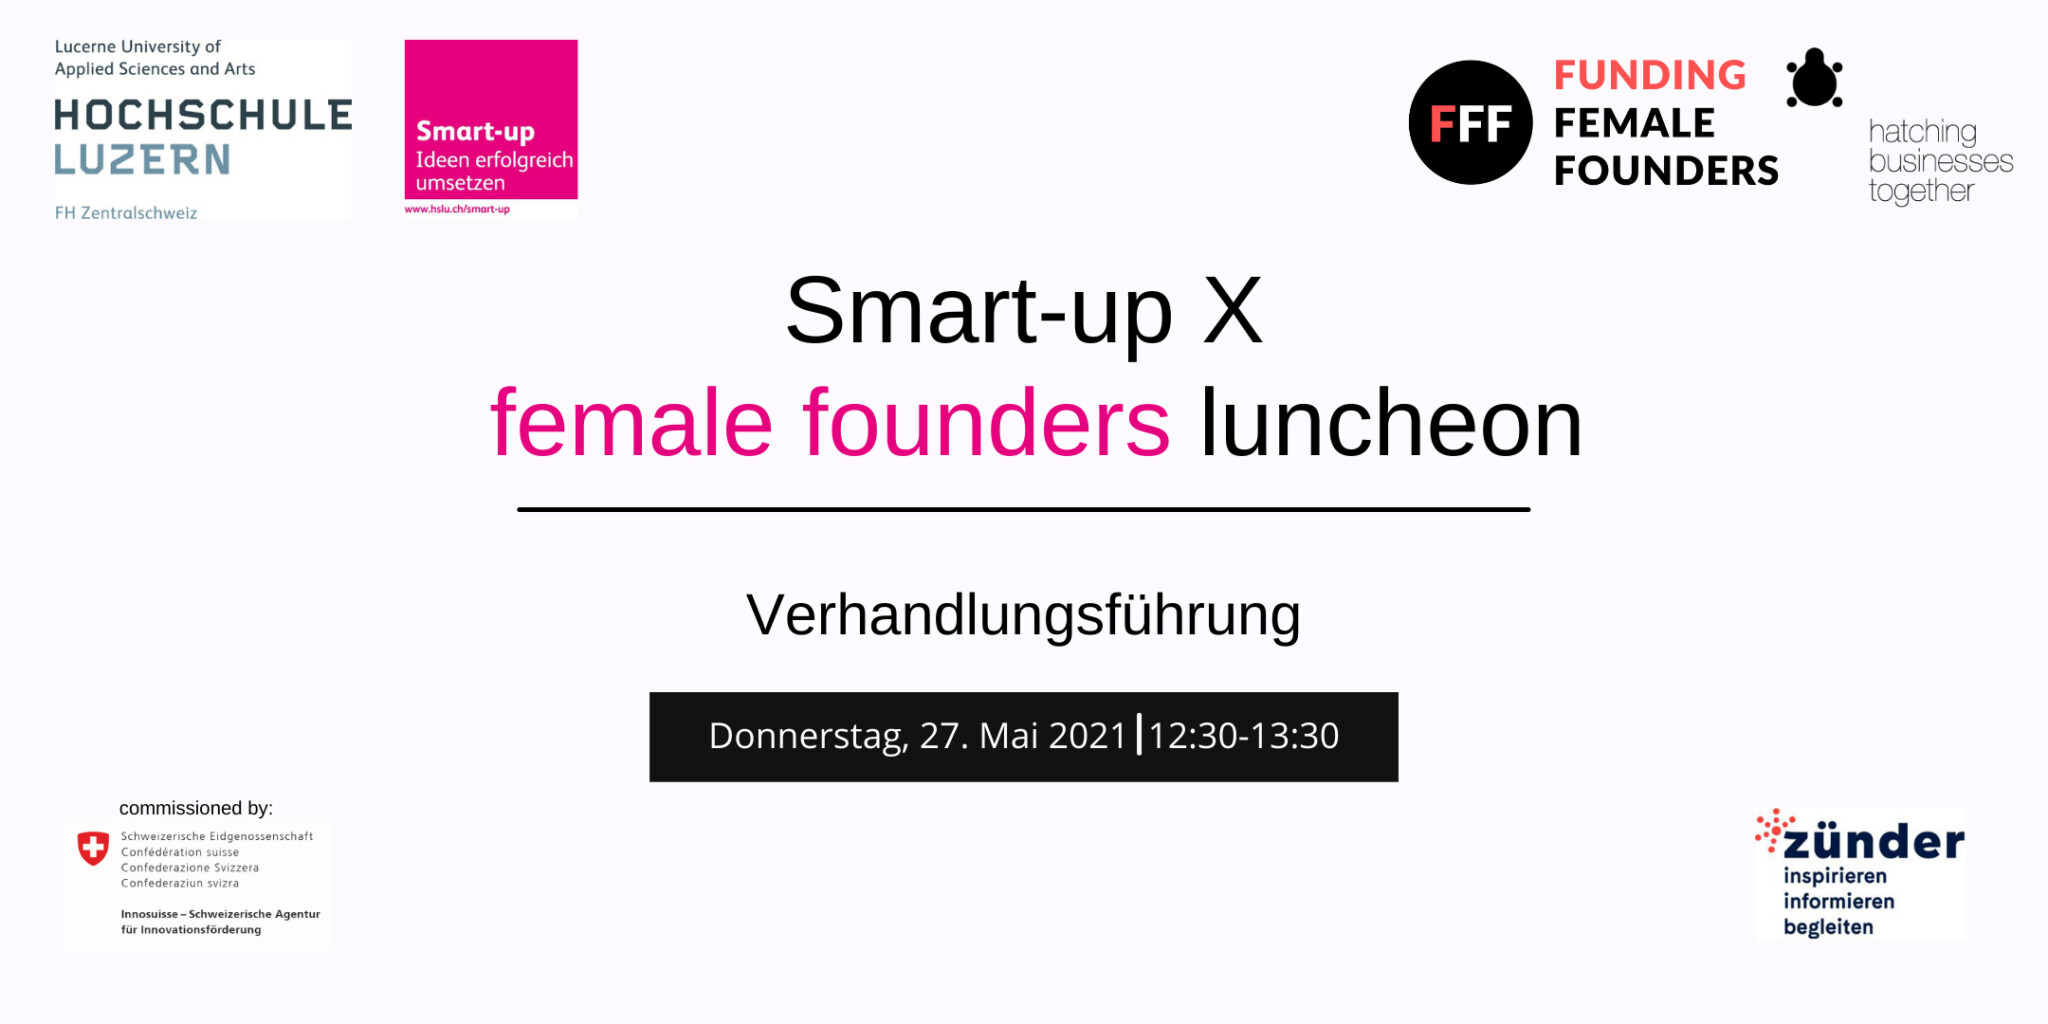 Smart-up X female founders luncheon – Verhandlungsführung